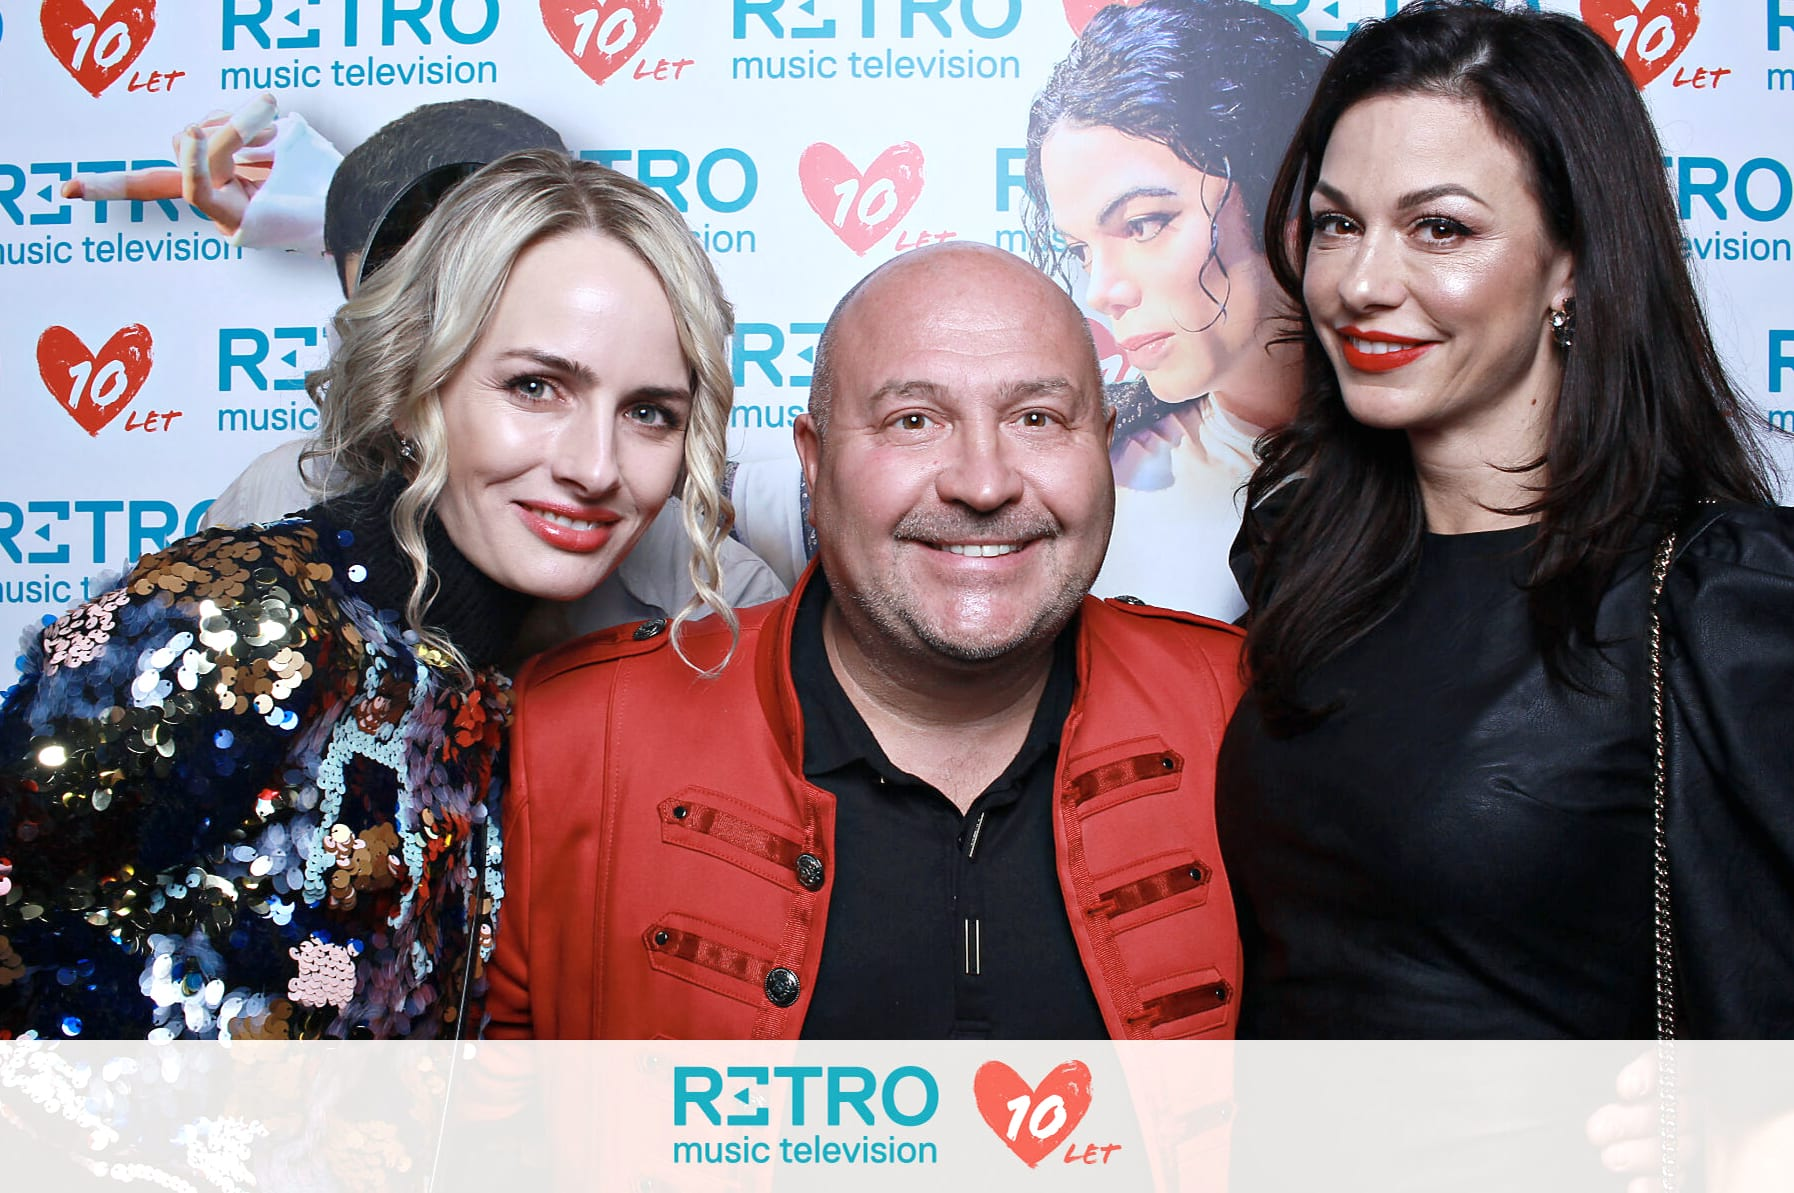 fotokoutek-firemni-vecirek-oslava-praha-retro-music-television-10-let-12-2-2020-718593